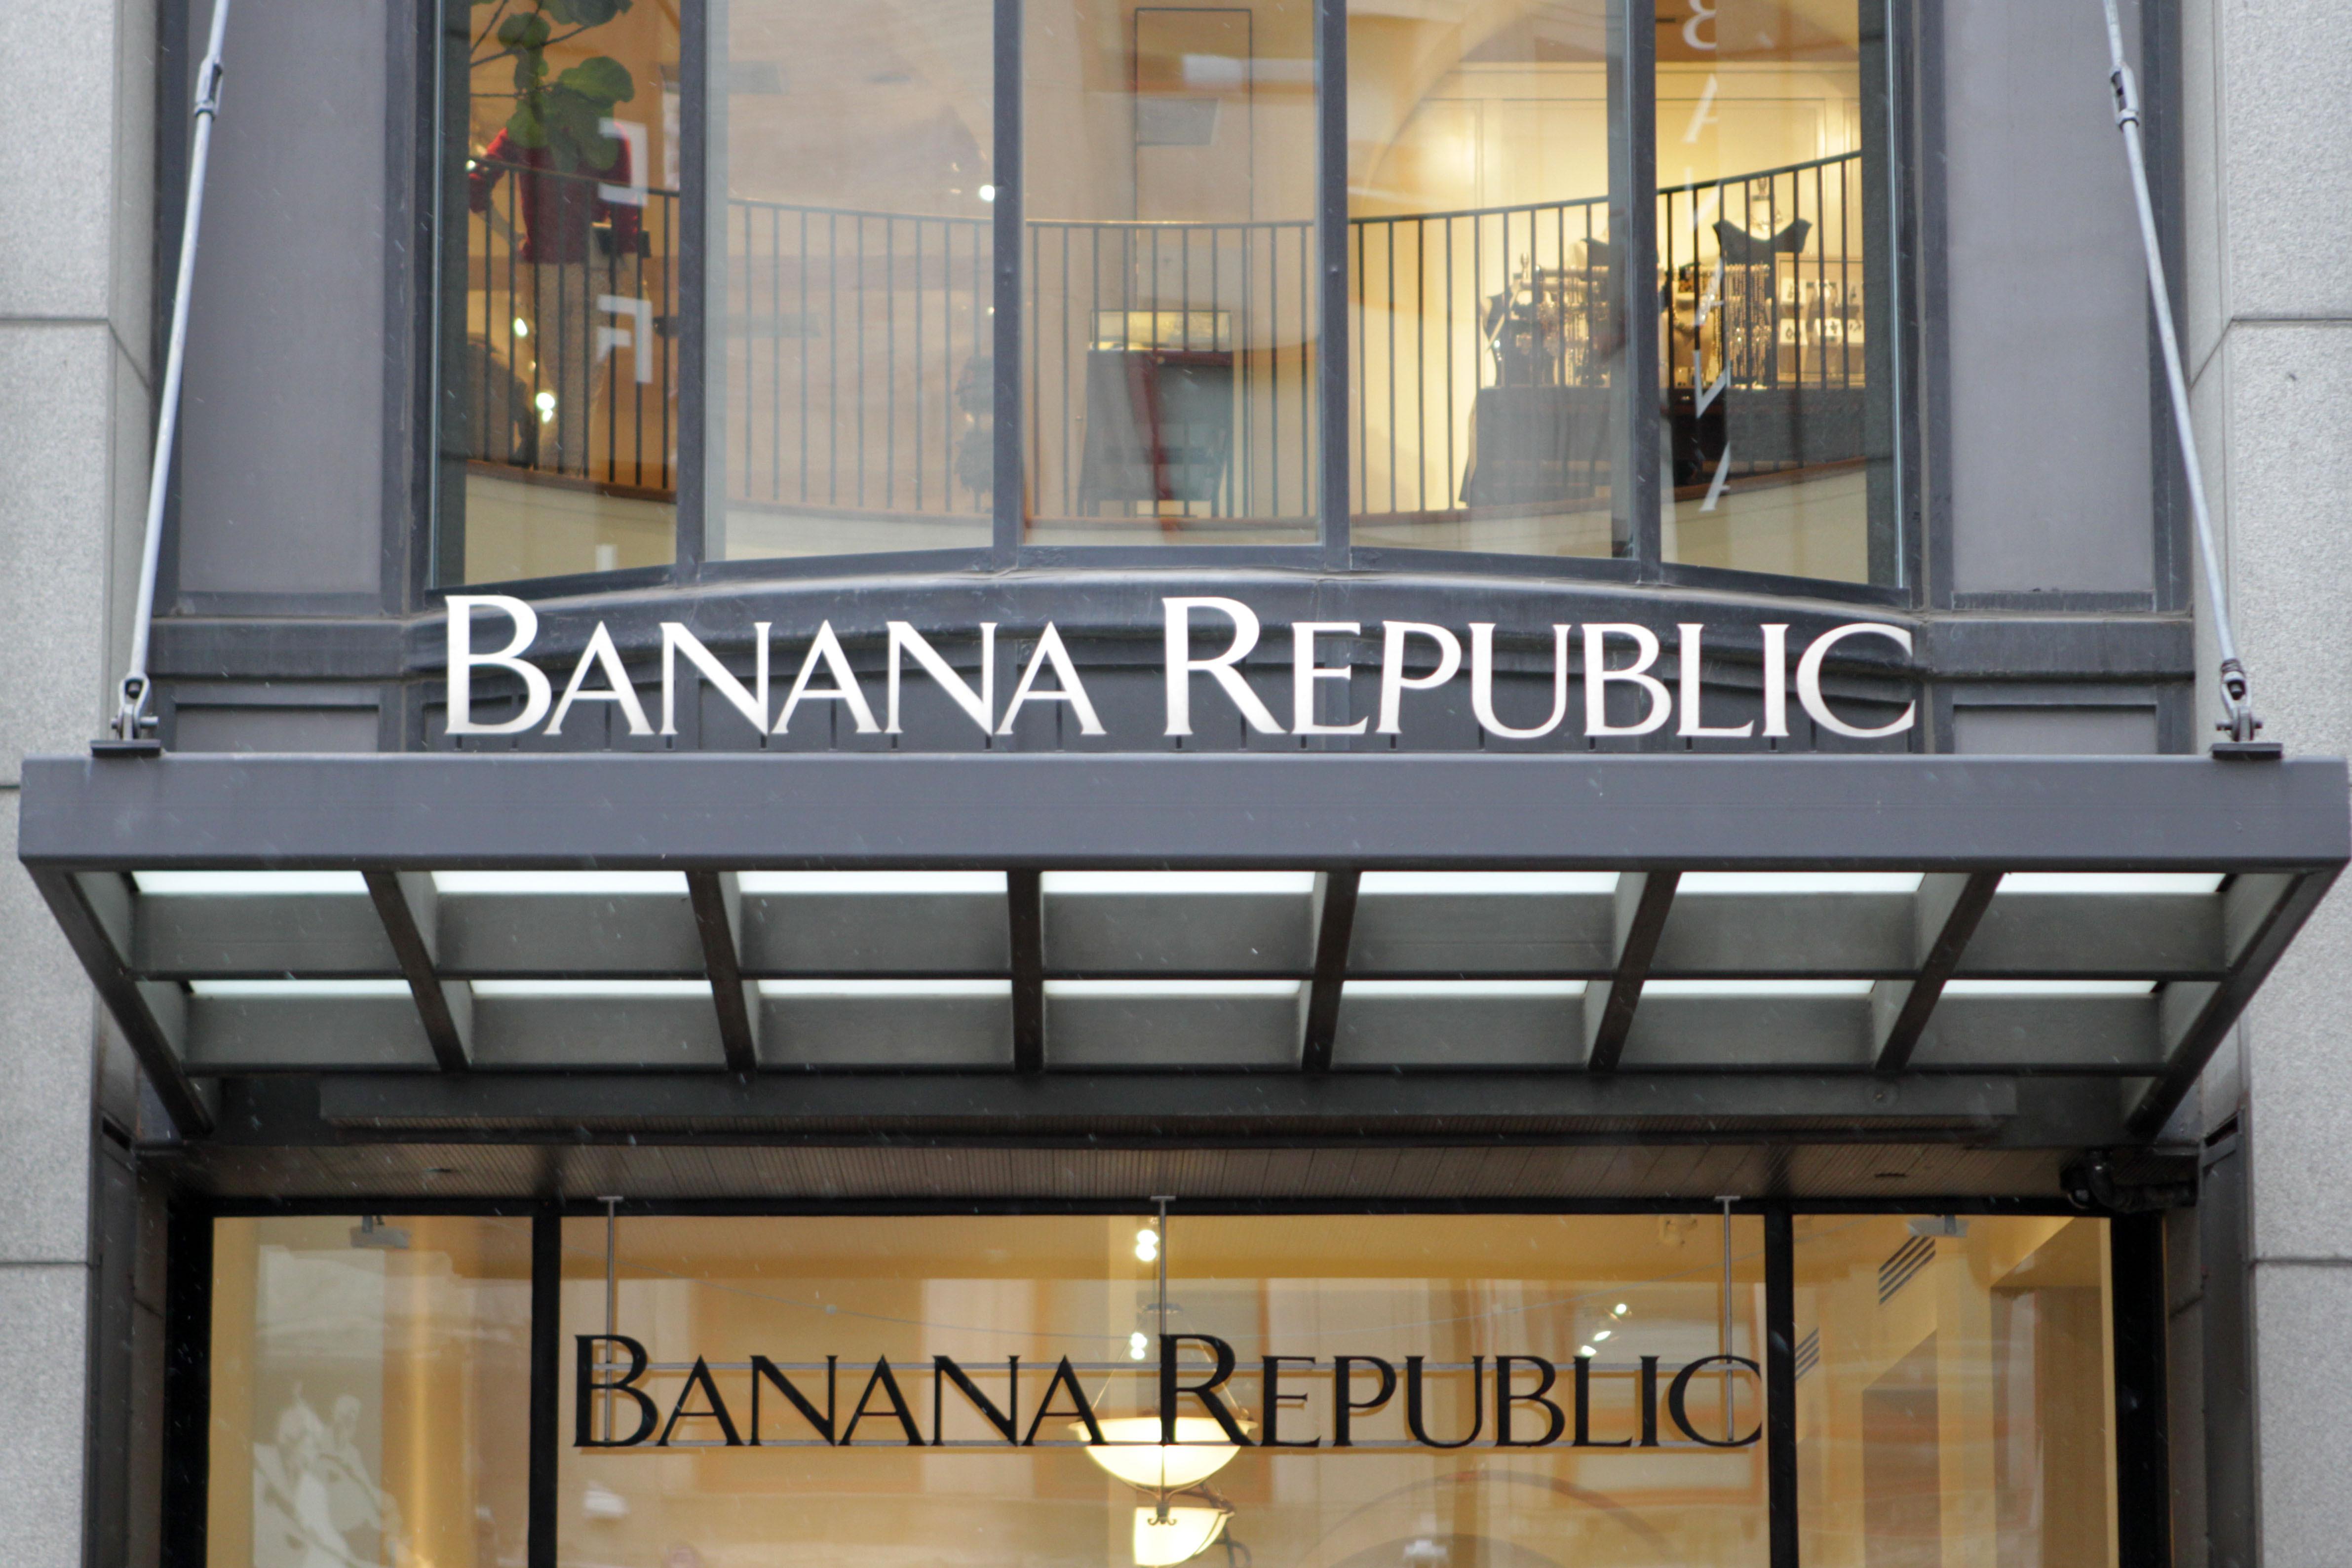 Banana Republic is part of Gap Inc.